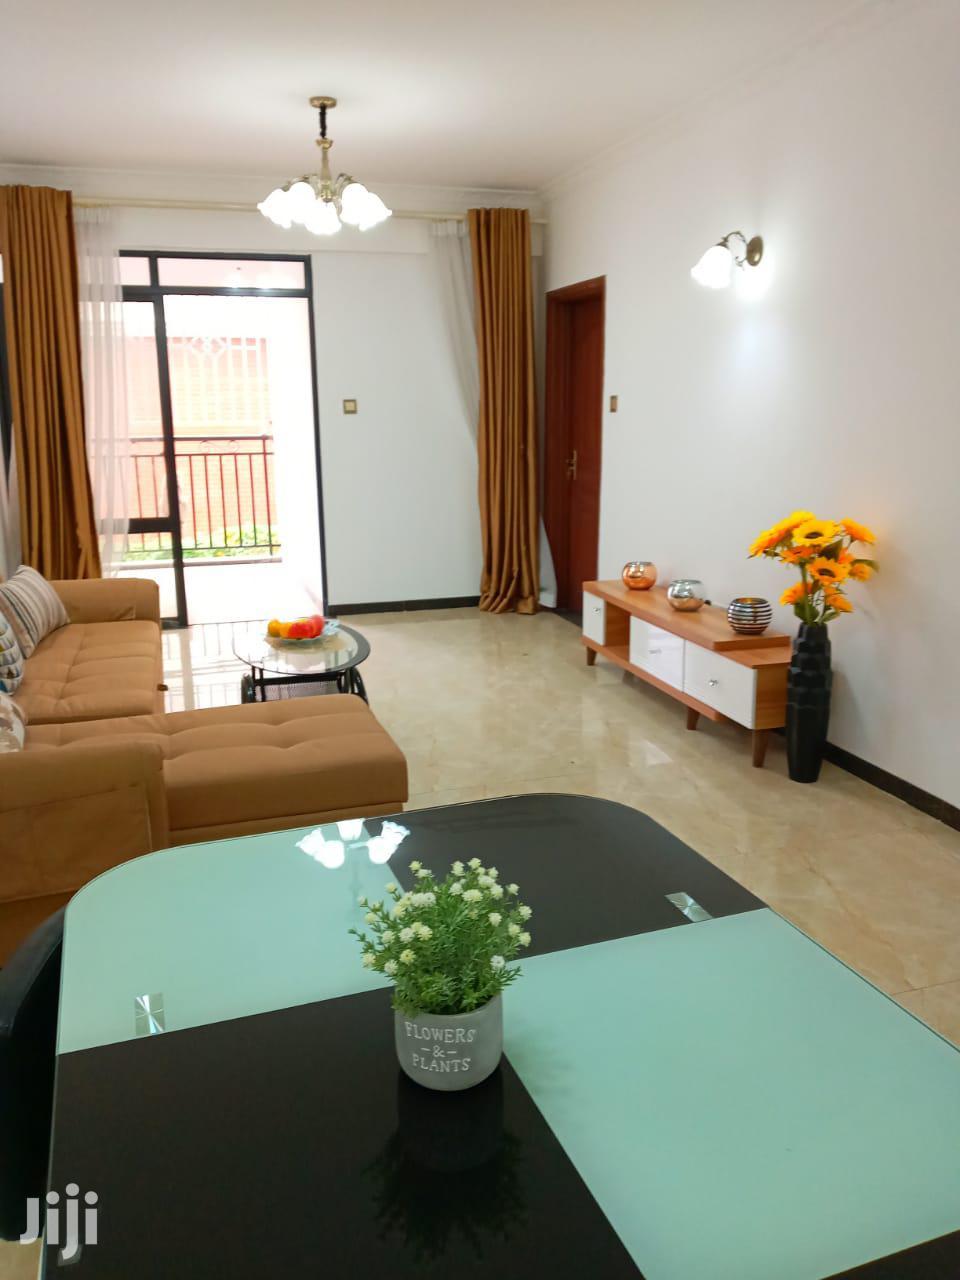 Hot Sale Brand New 3 Bedroom Master Ensuite In Kilimani | Houses & Apartments For Sale for sale in Kilimani, Nairobi, Kenya